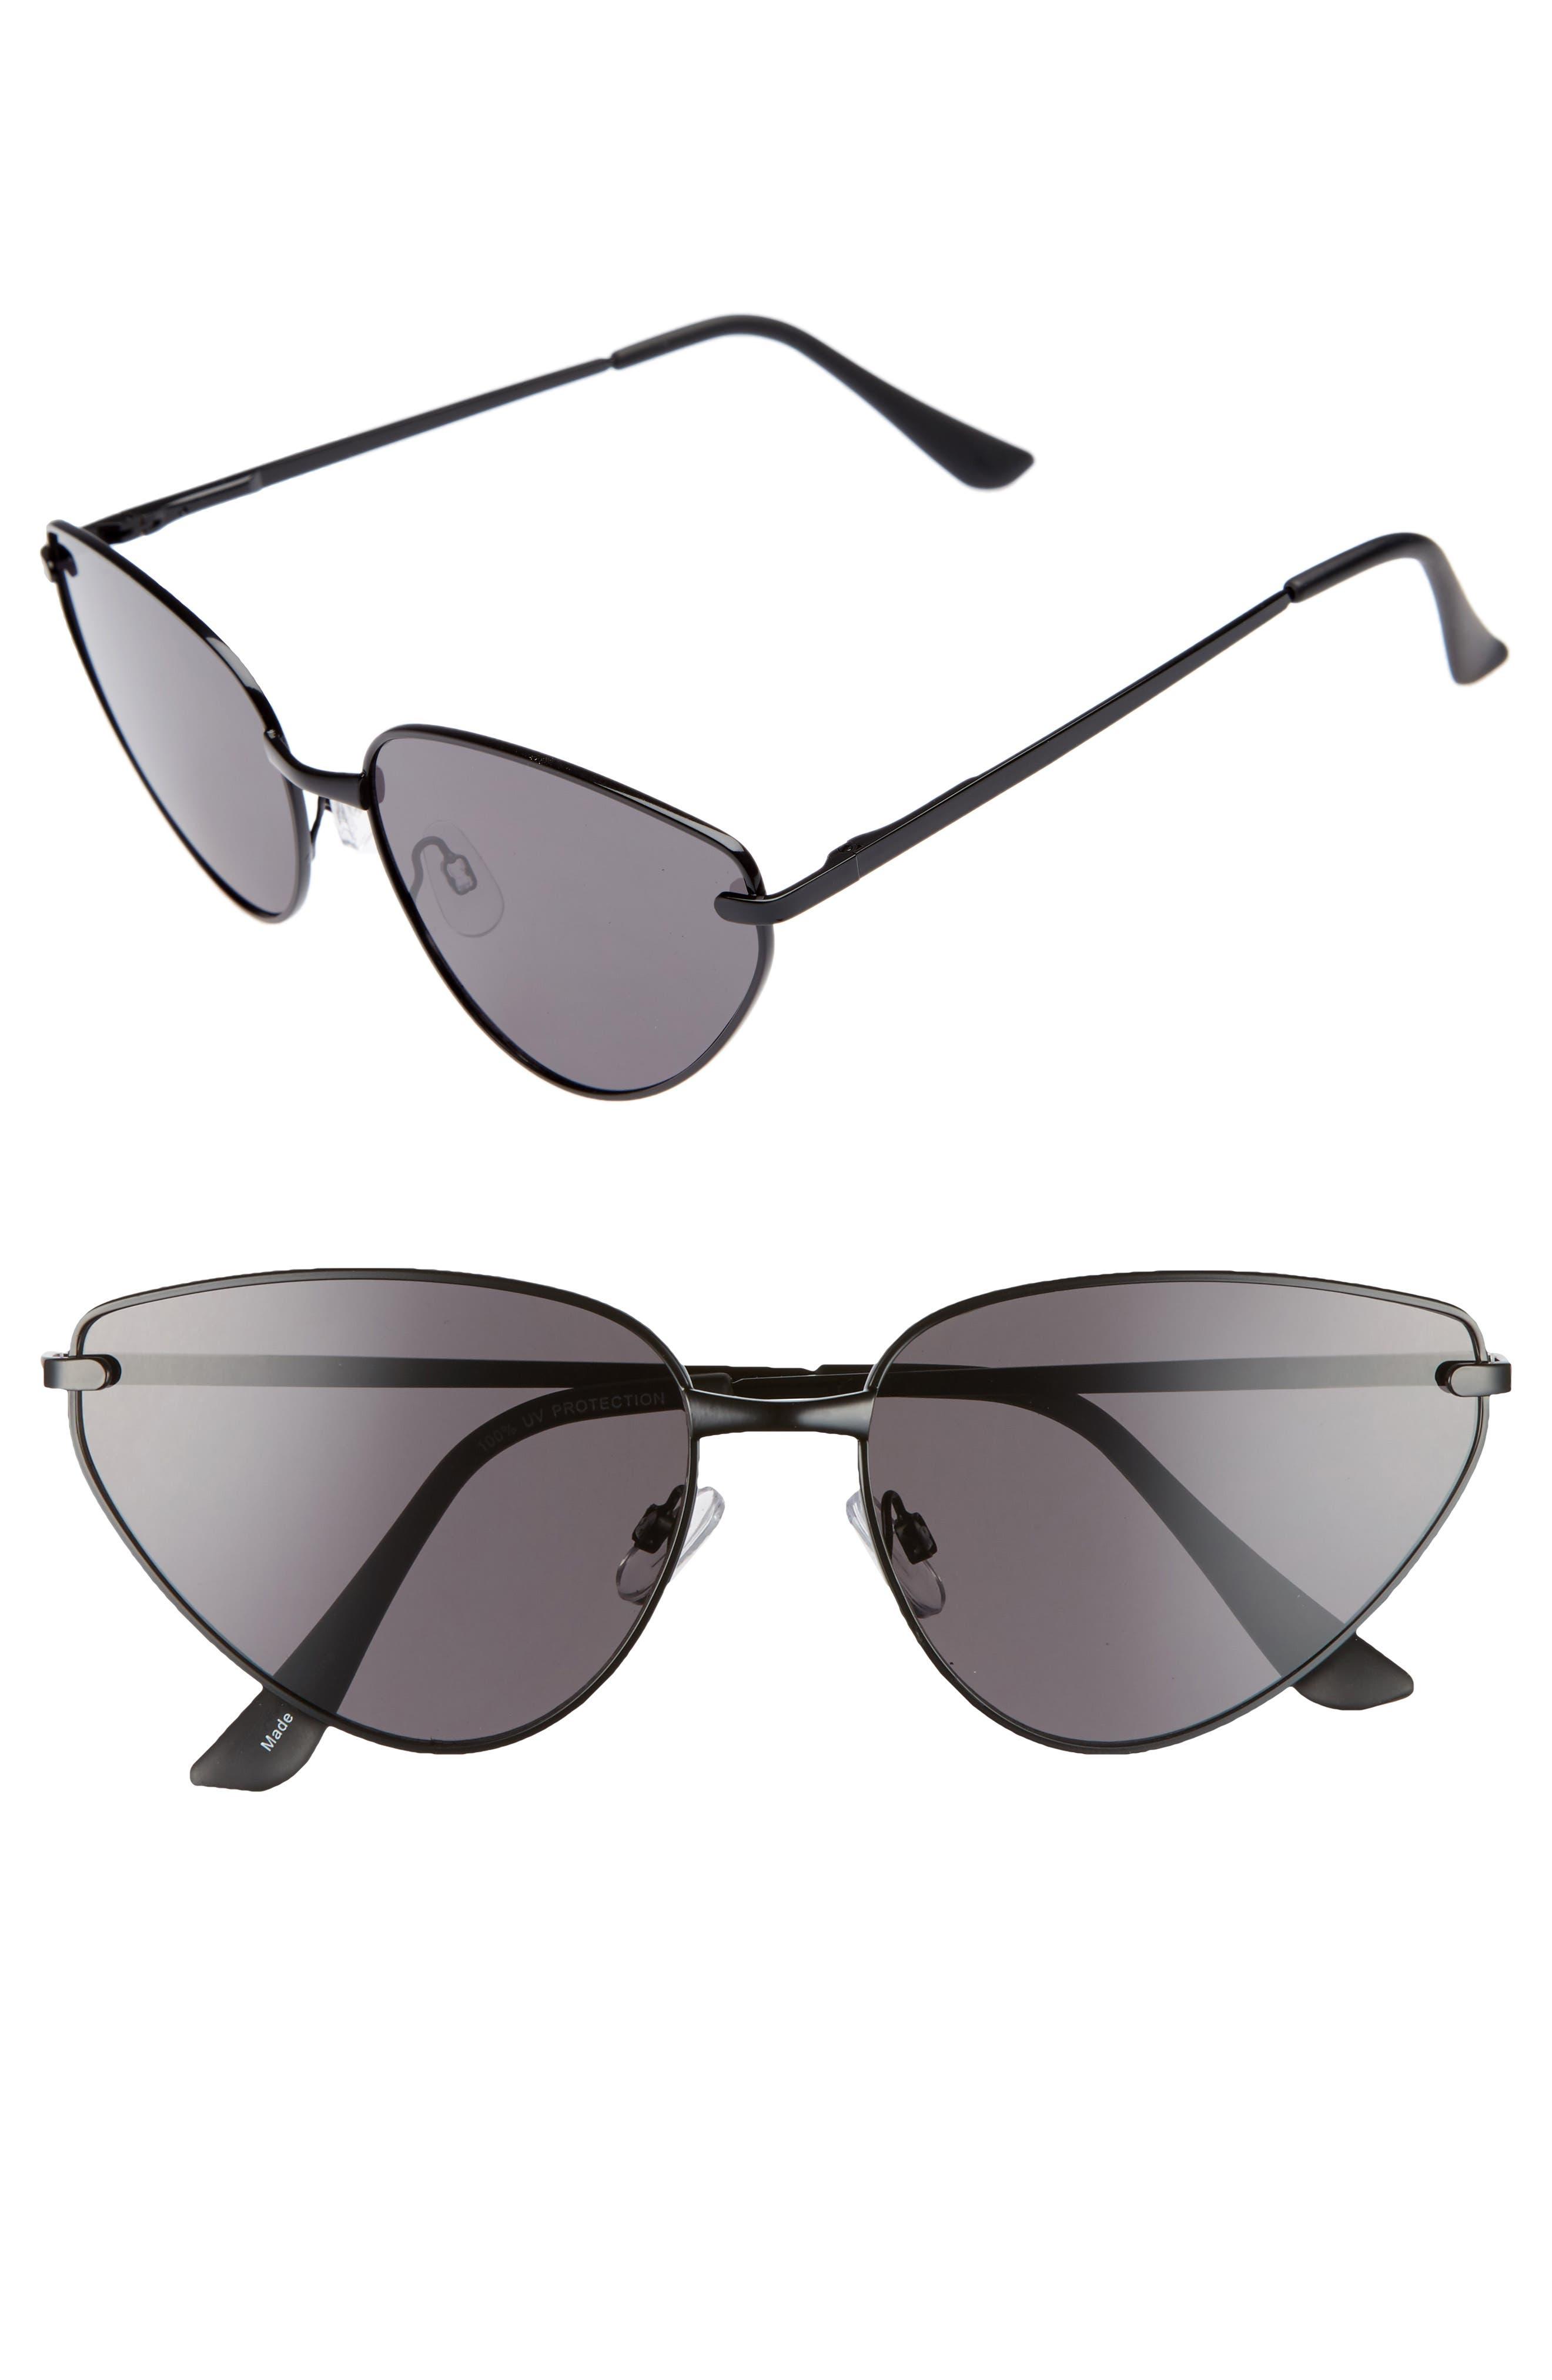 Main Image - BP. 60mm Exaggerated Cat Eye Sunglasses